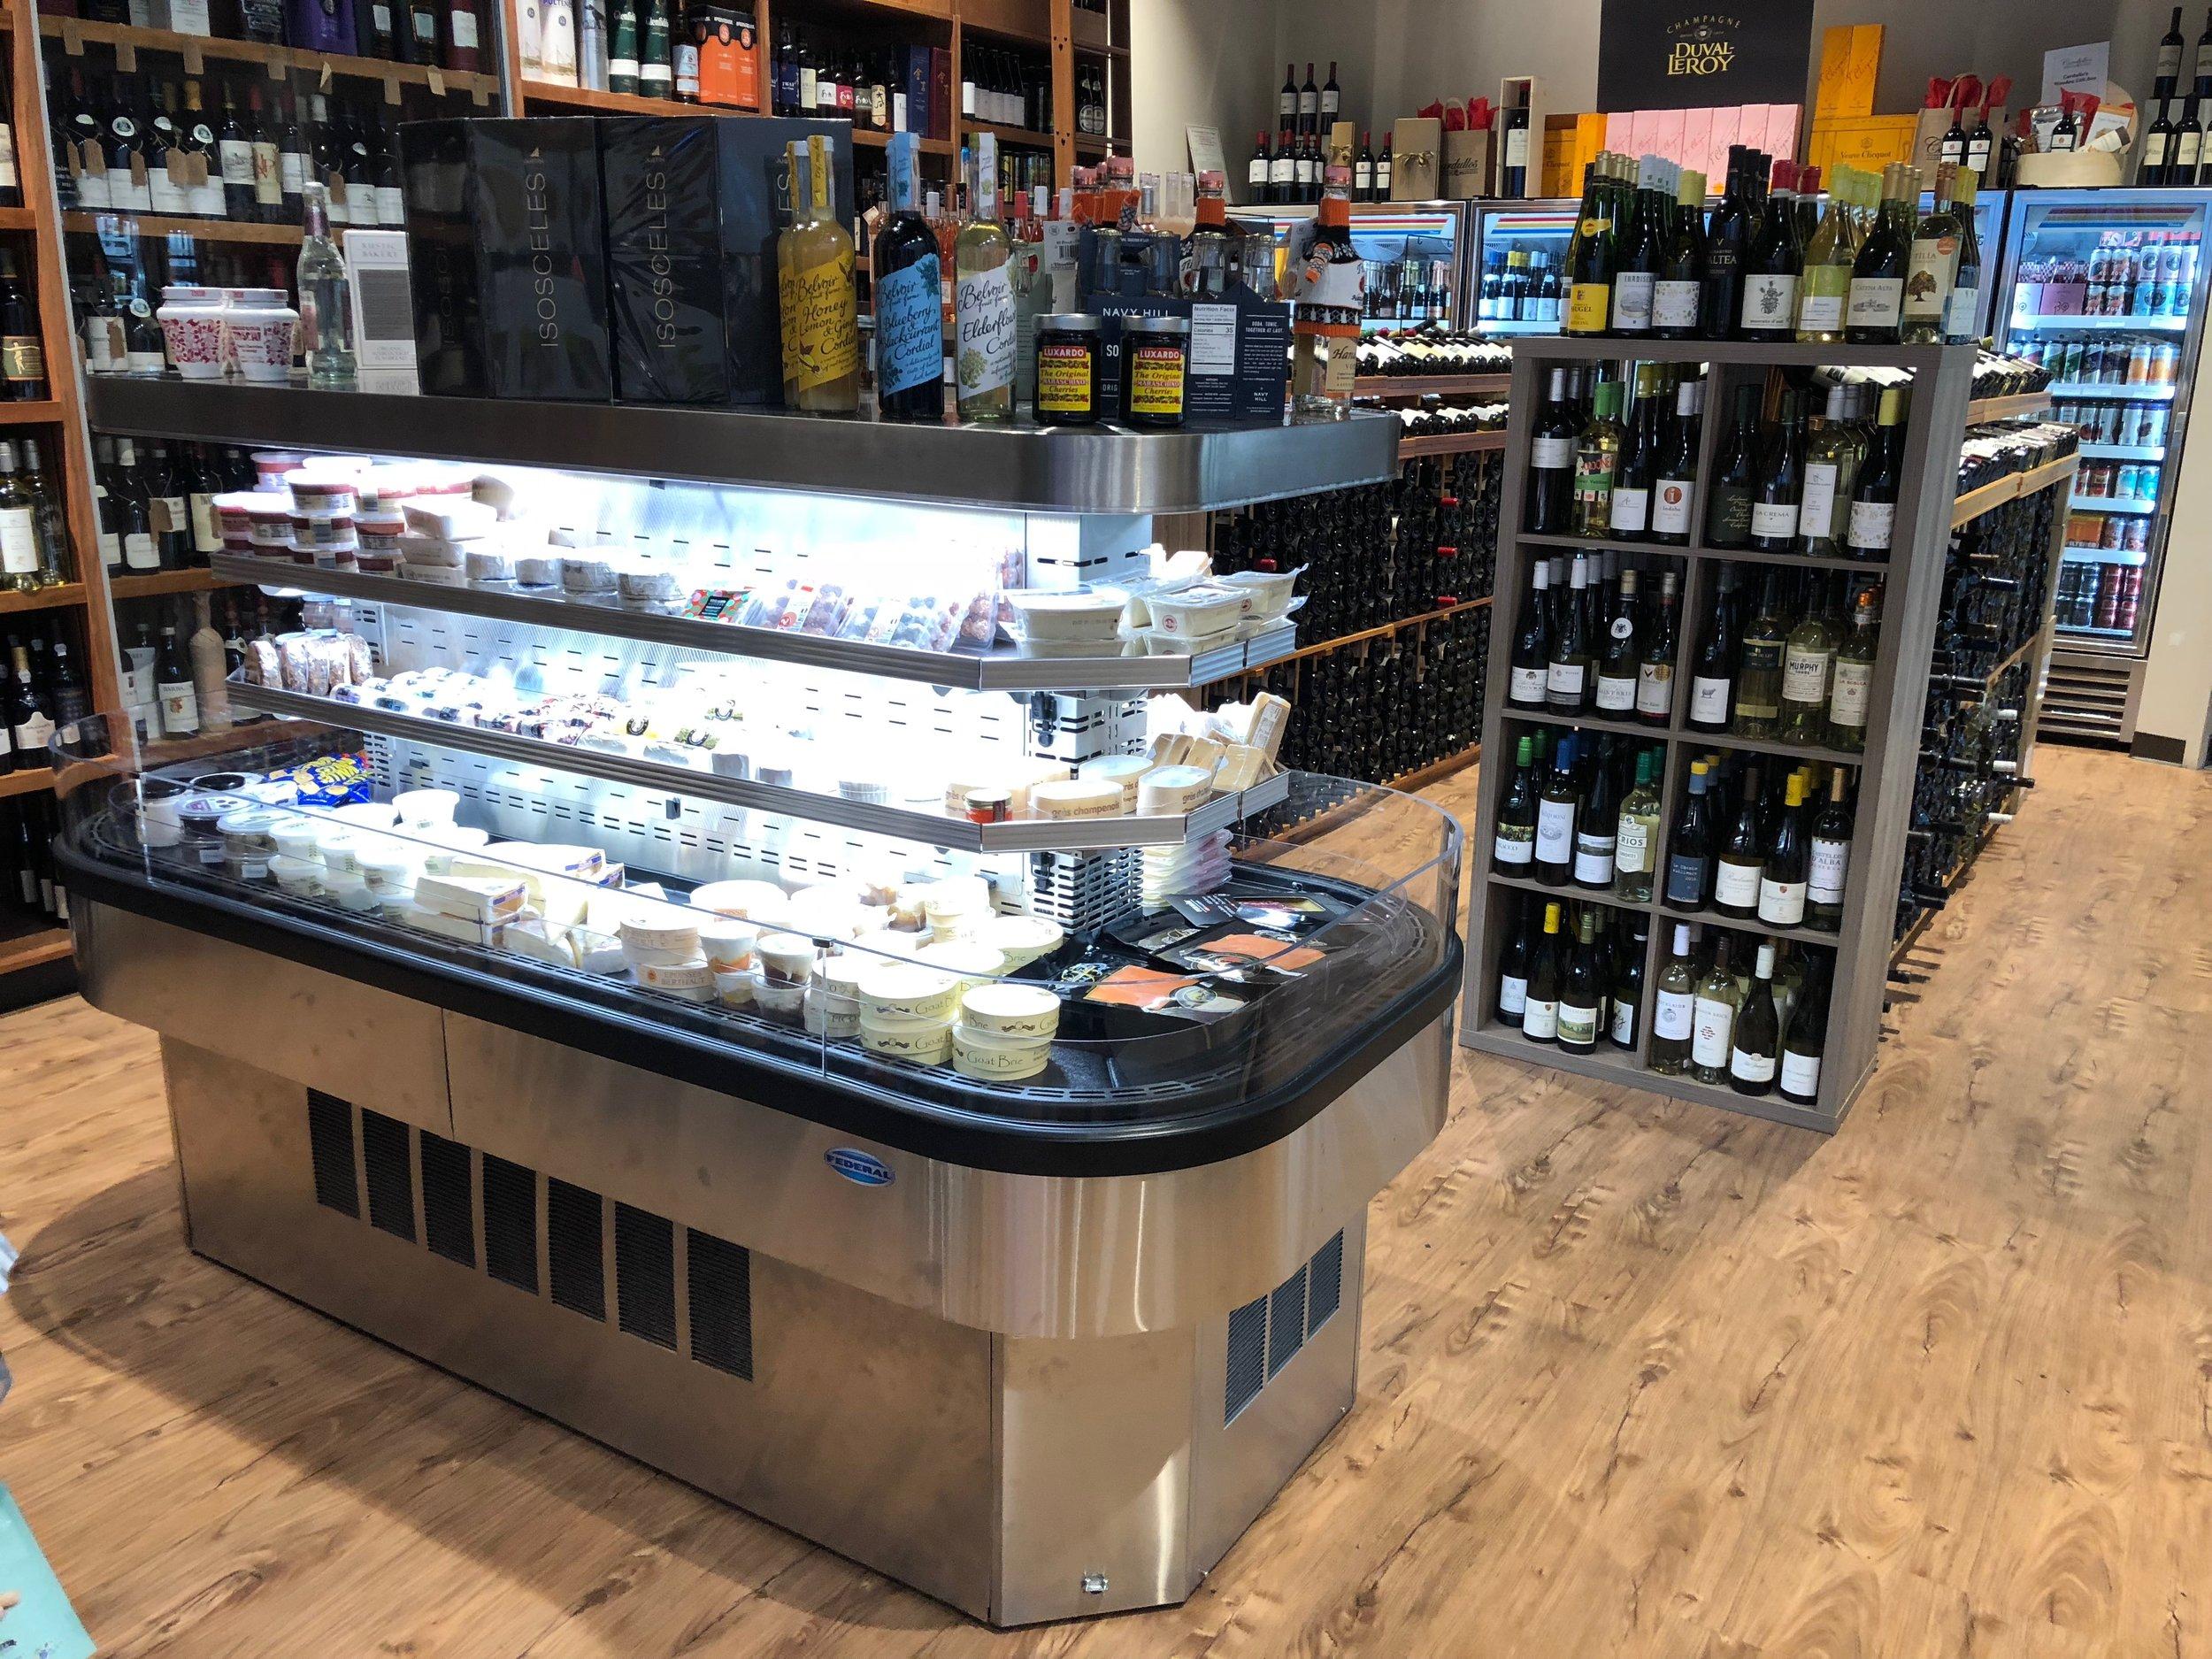 Cardullo's Gourmet Shoppe - Boston, MA